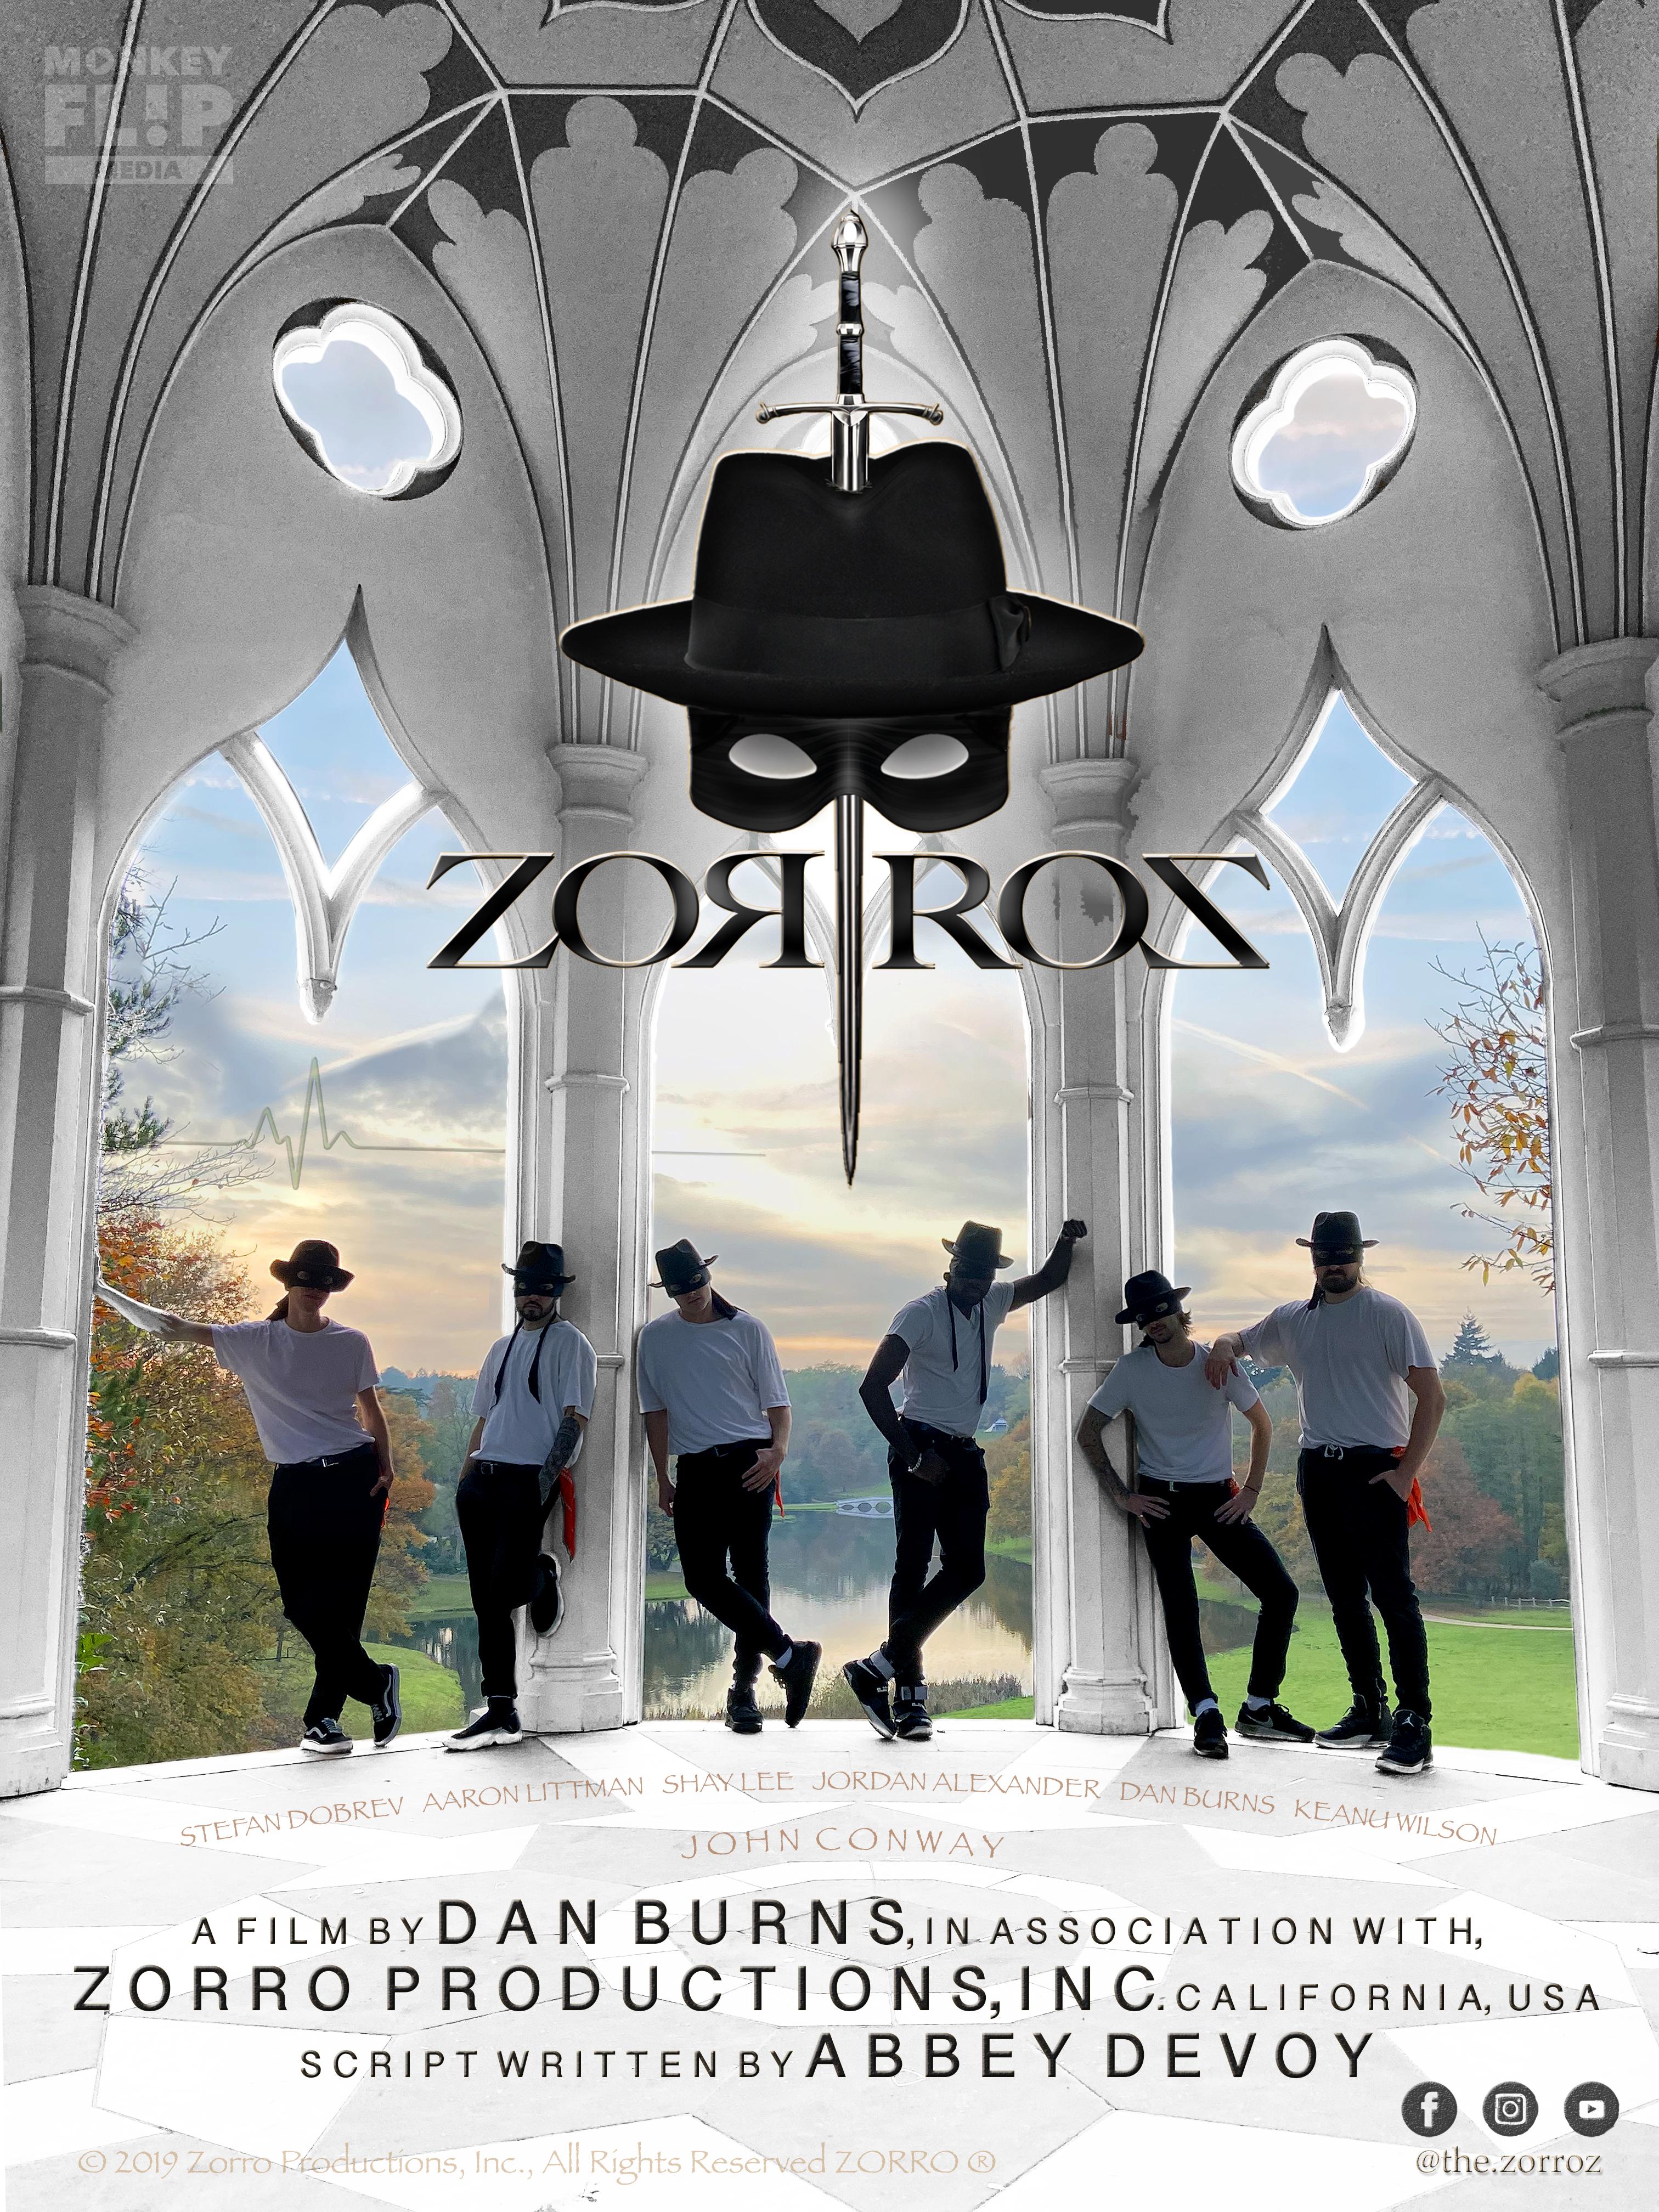 Zorroz DVD Poster